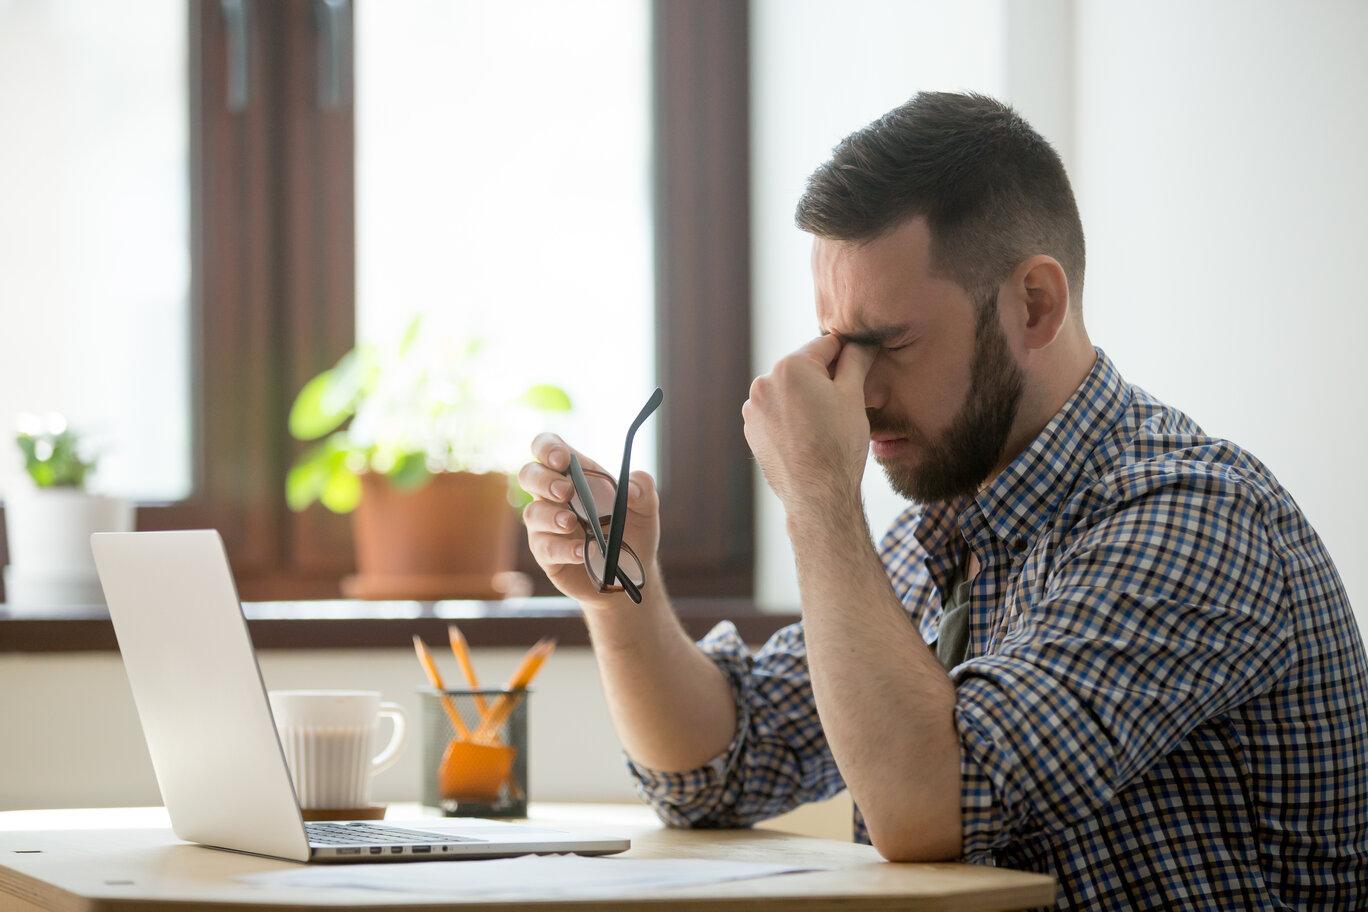 Stressed male massaging nose bridge suffering from headache